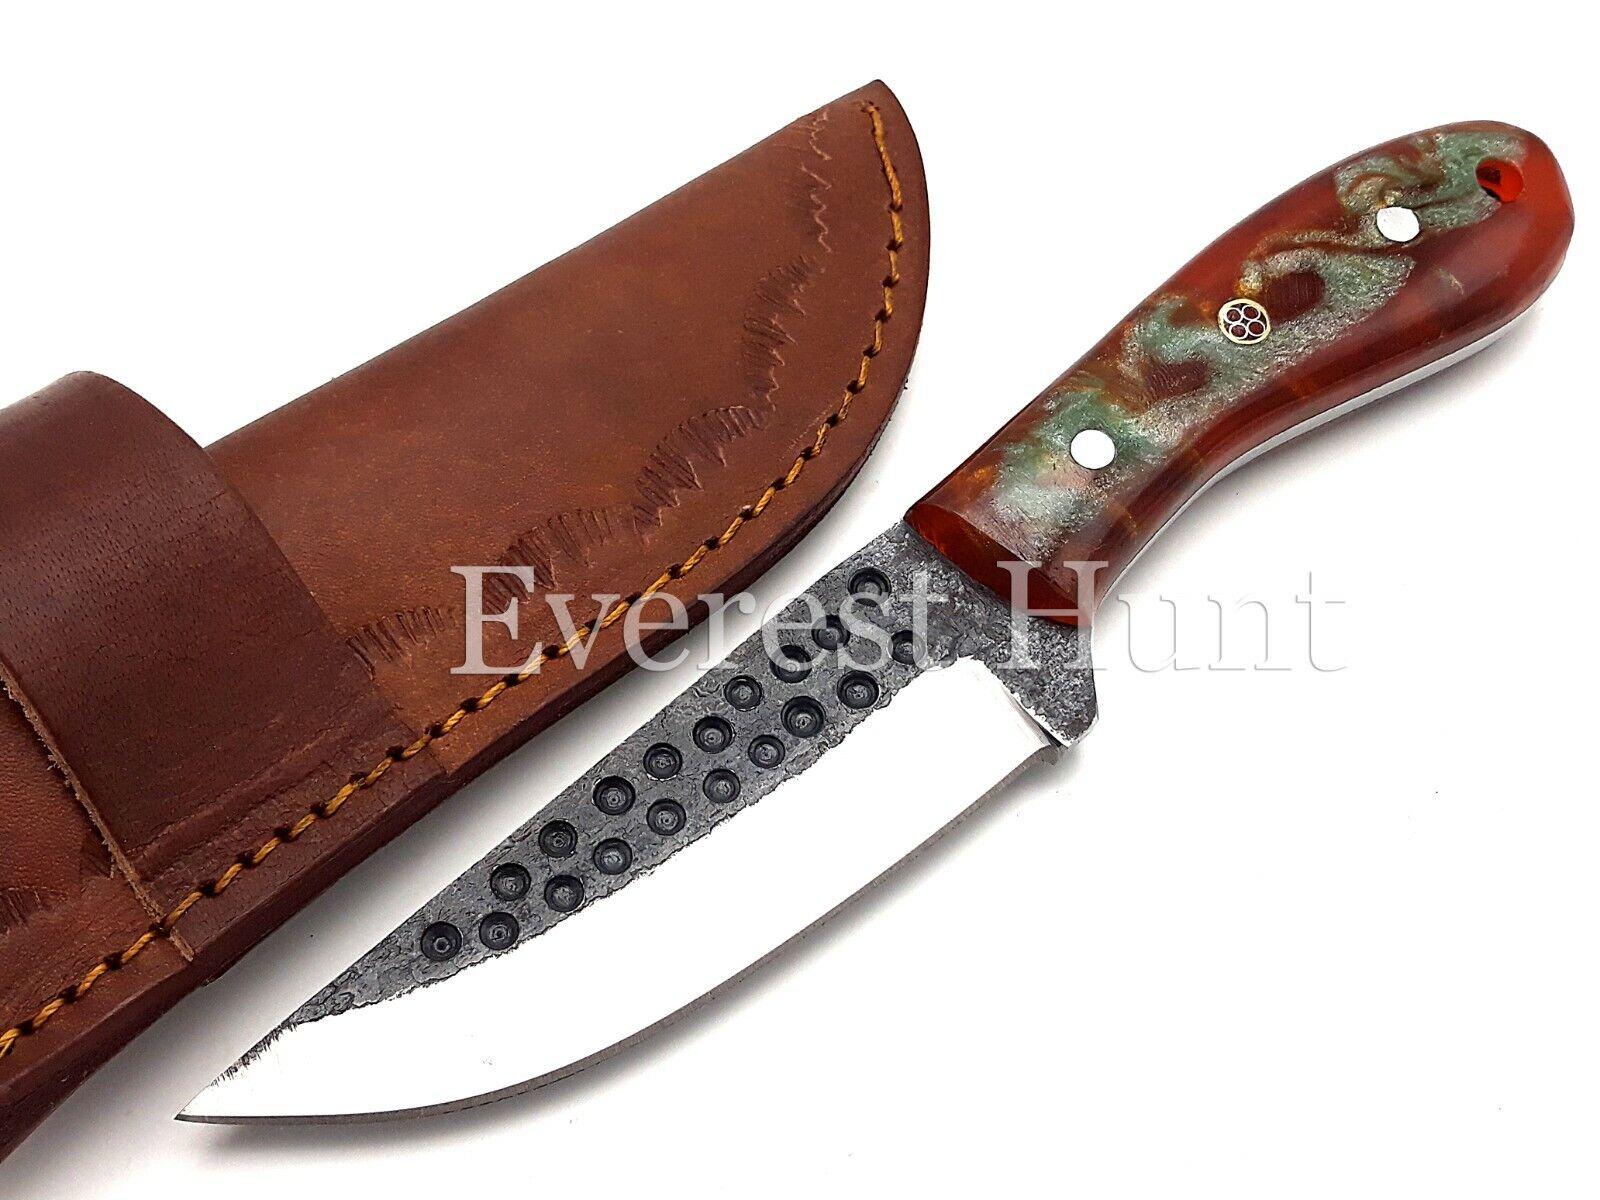 EH CUSTOM HANDMADE D2 HAMMERED STEEL HUNTING CAMP SKINNER KNIFE RAMS HORN B6-38 - $13.63